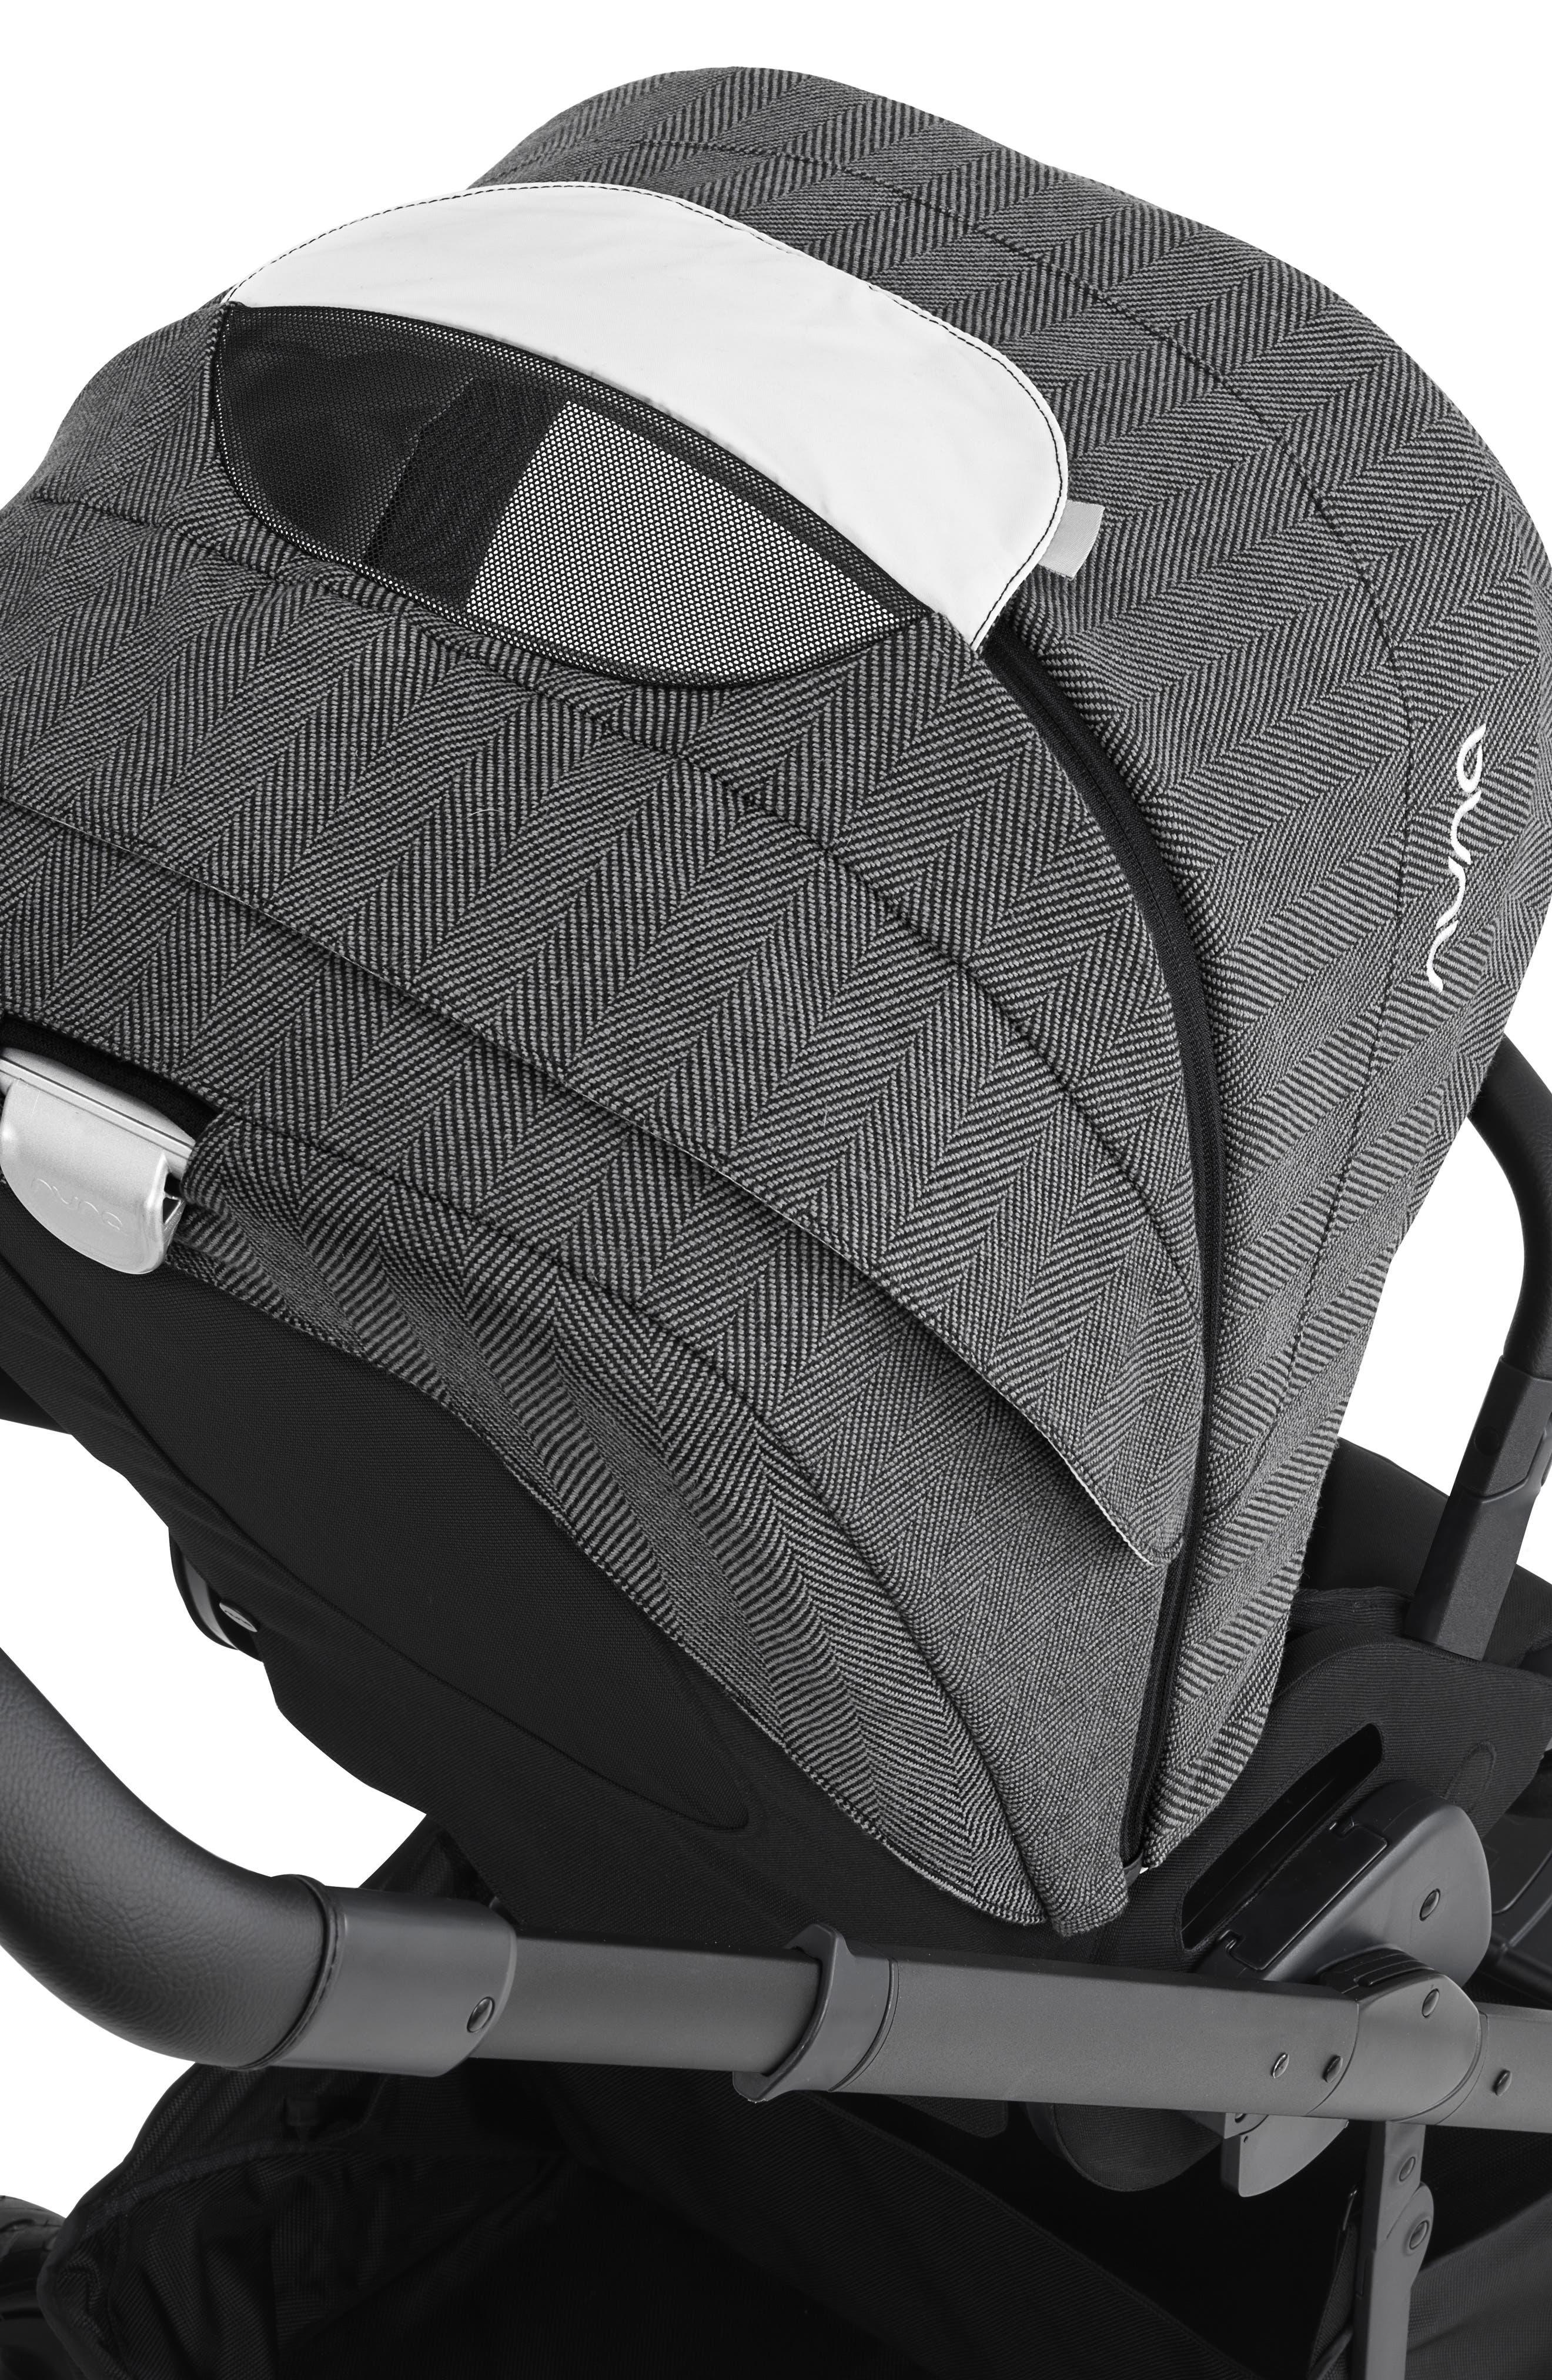 2019 MIXX<sup>™</sup> Stroller & PIPA<sup>™</sup> Lite LX Infant Car Seat Set Travel System,                             Alternate thumbnail 12, color,                             VERONA CAVIAR